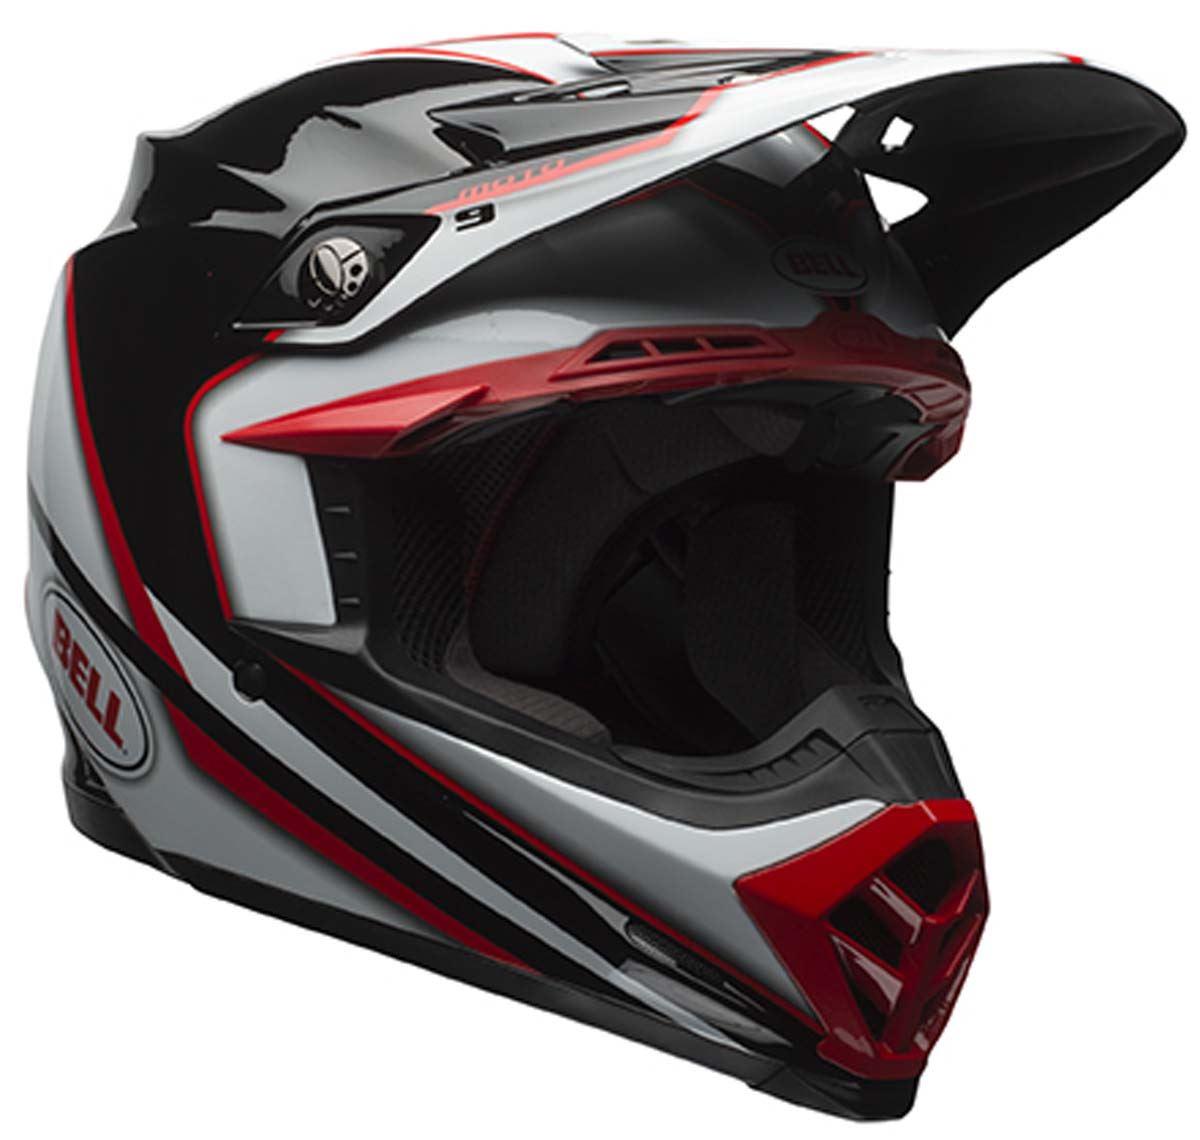 bell moto 9 off road dirt bike mx motorcycle helmet ebay. Black Bedroom Furniture Sets. Home Design Ideas